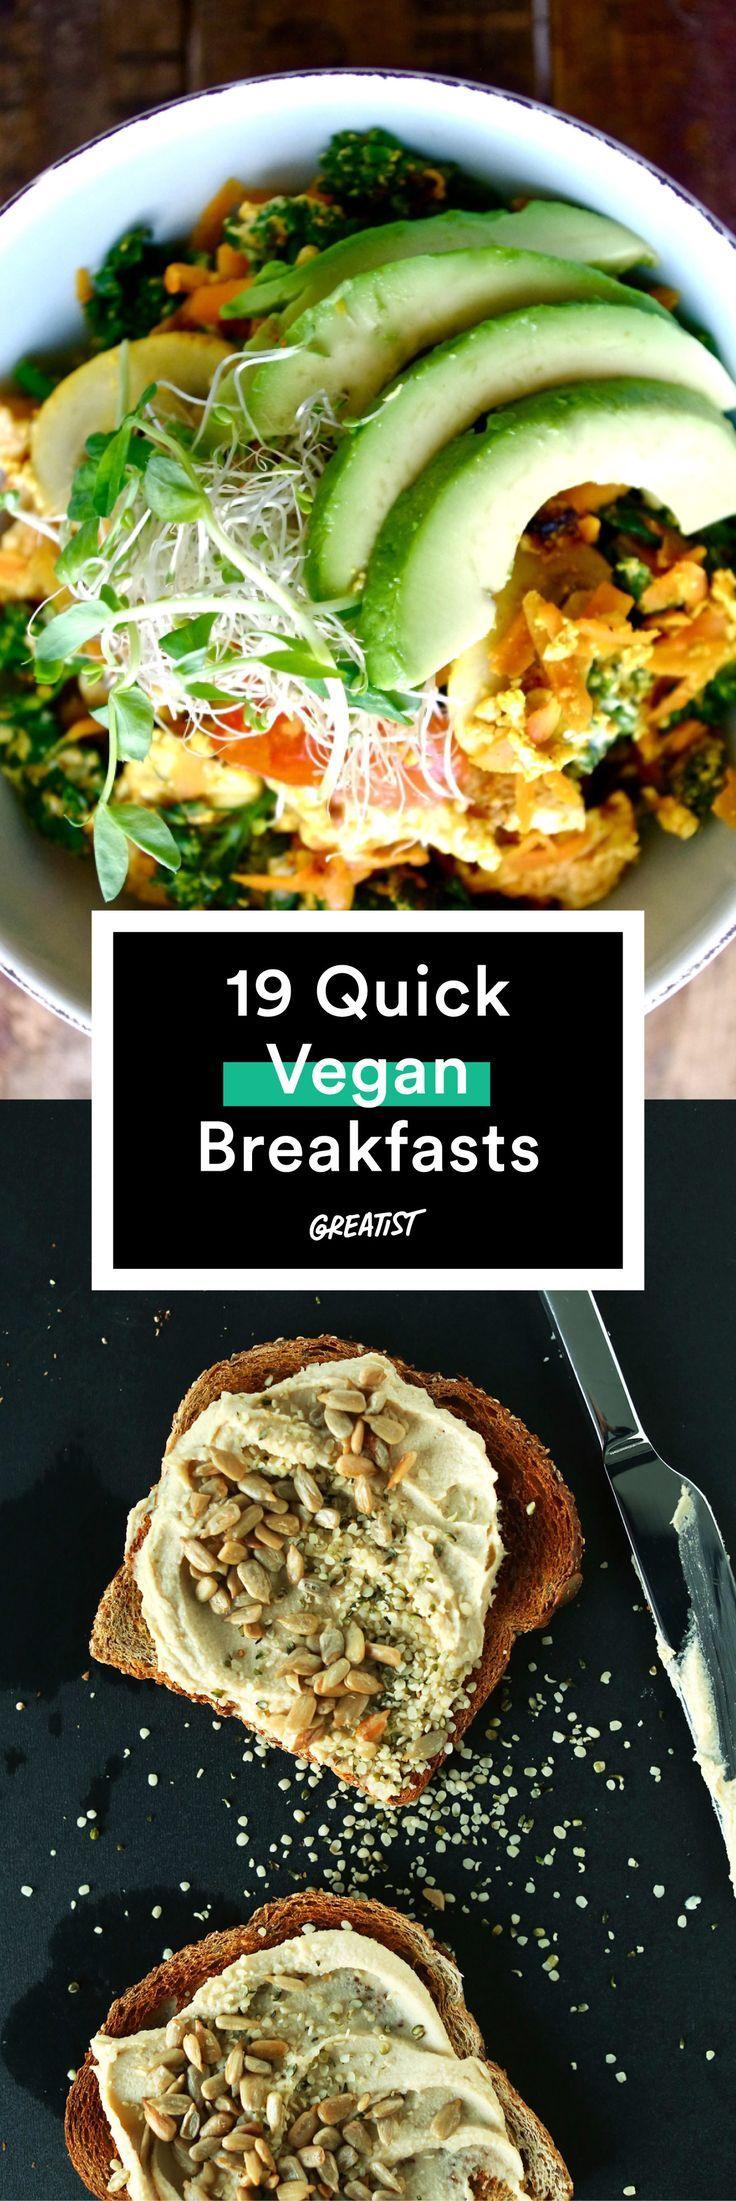 22 Vegan Breakfast Recipes Quick Vegan Breakfast Whole Food Recipes Healthy Vegan